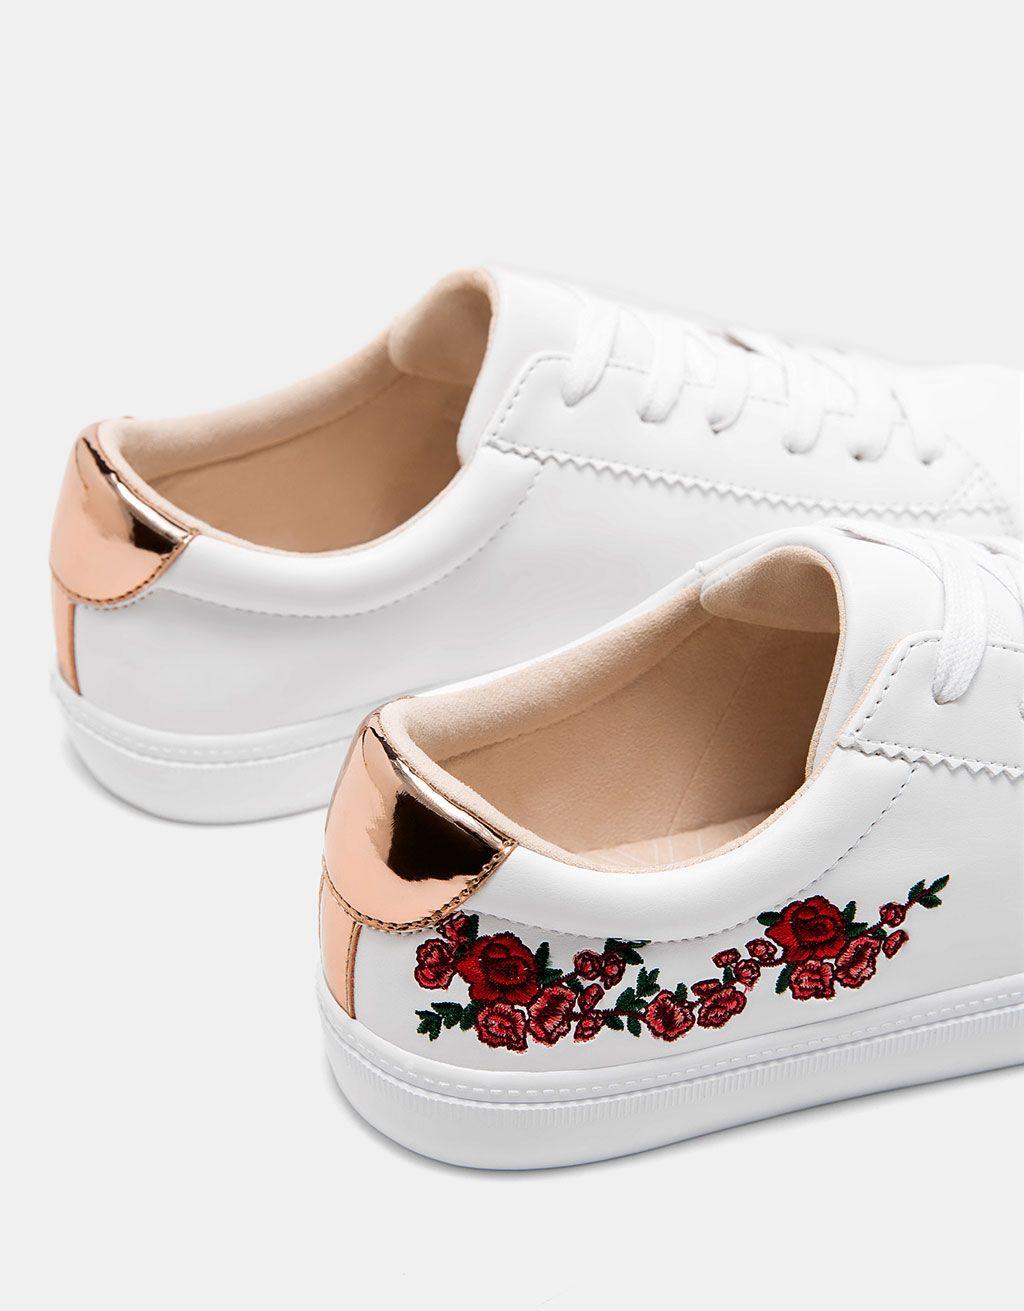 official photos dd085 f8534 These shoes are fire 🔥. Zapatilla bordado flores detalle metalizado.  Descubre ésta y muchas otras prendas en Bershka con nuevos productos cada  semana